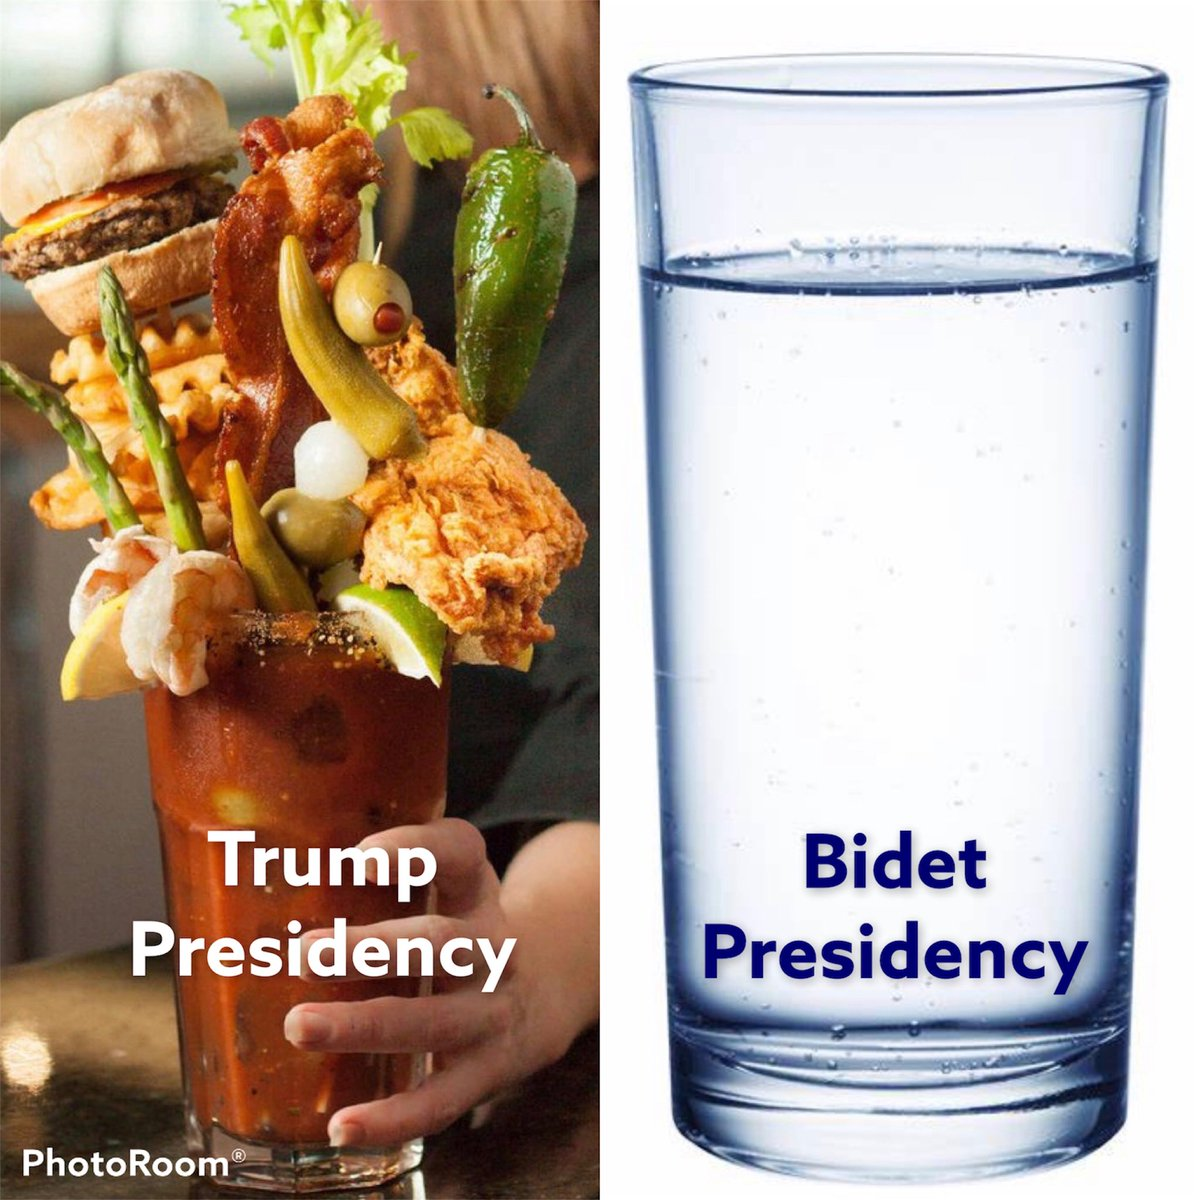 #Biden #InaugurationDay #AmericaOrTrump #COVID19 #Trump